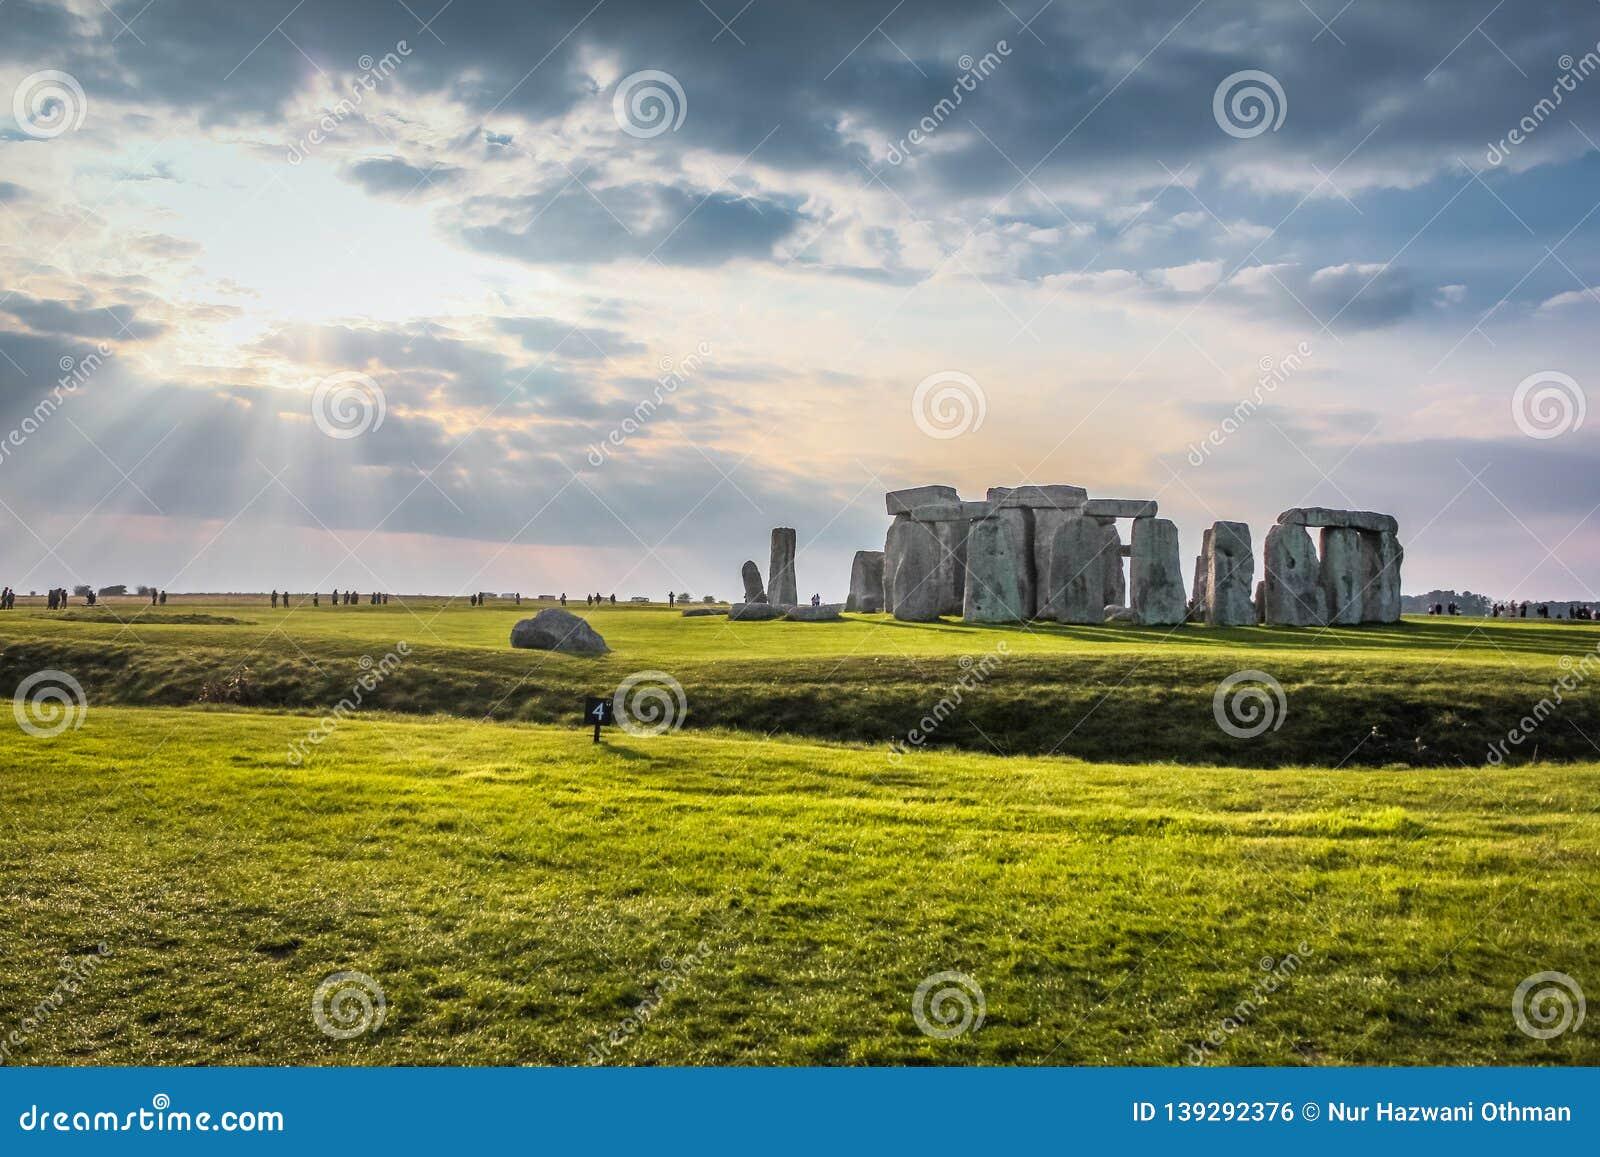 Stonehenge was passed by sun